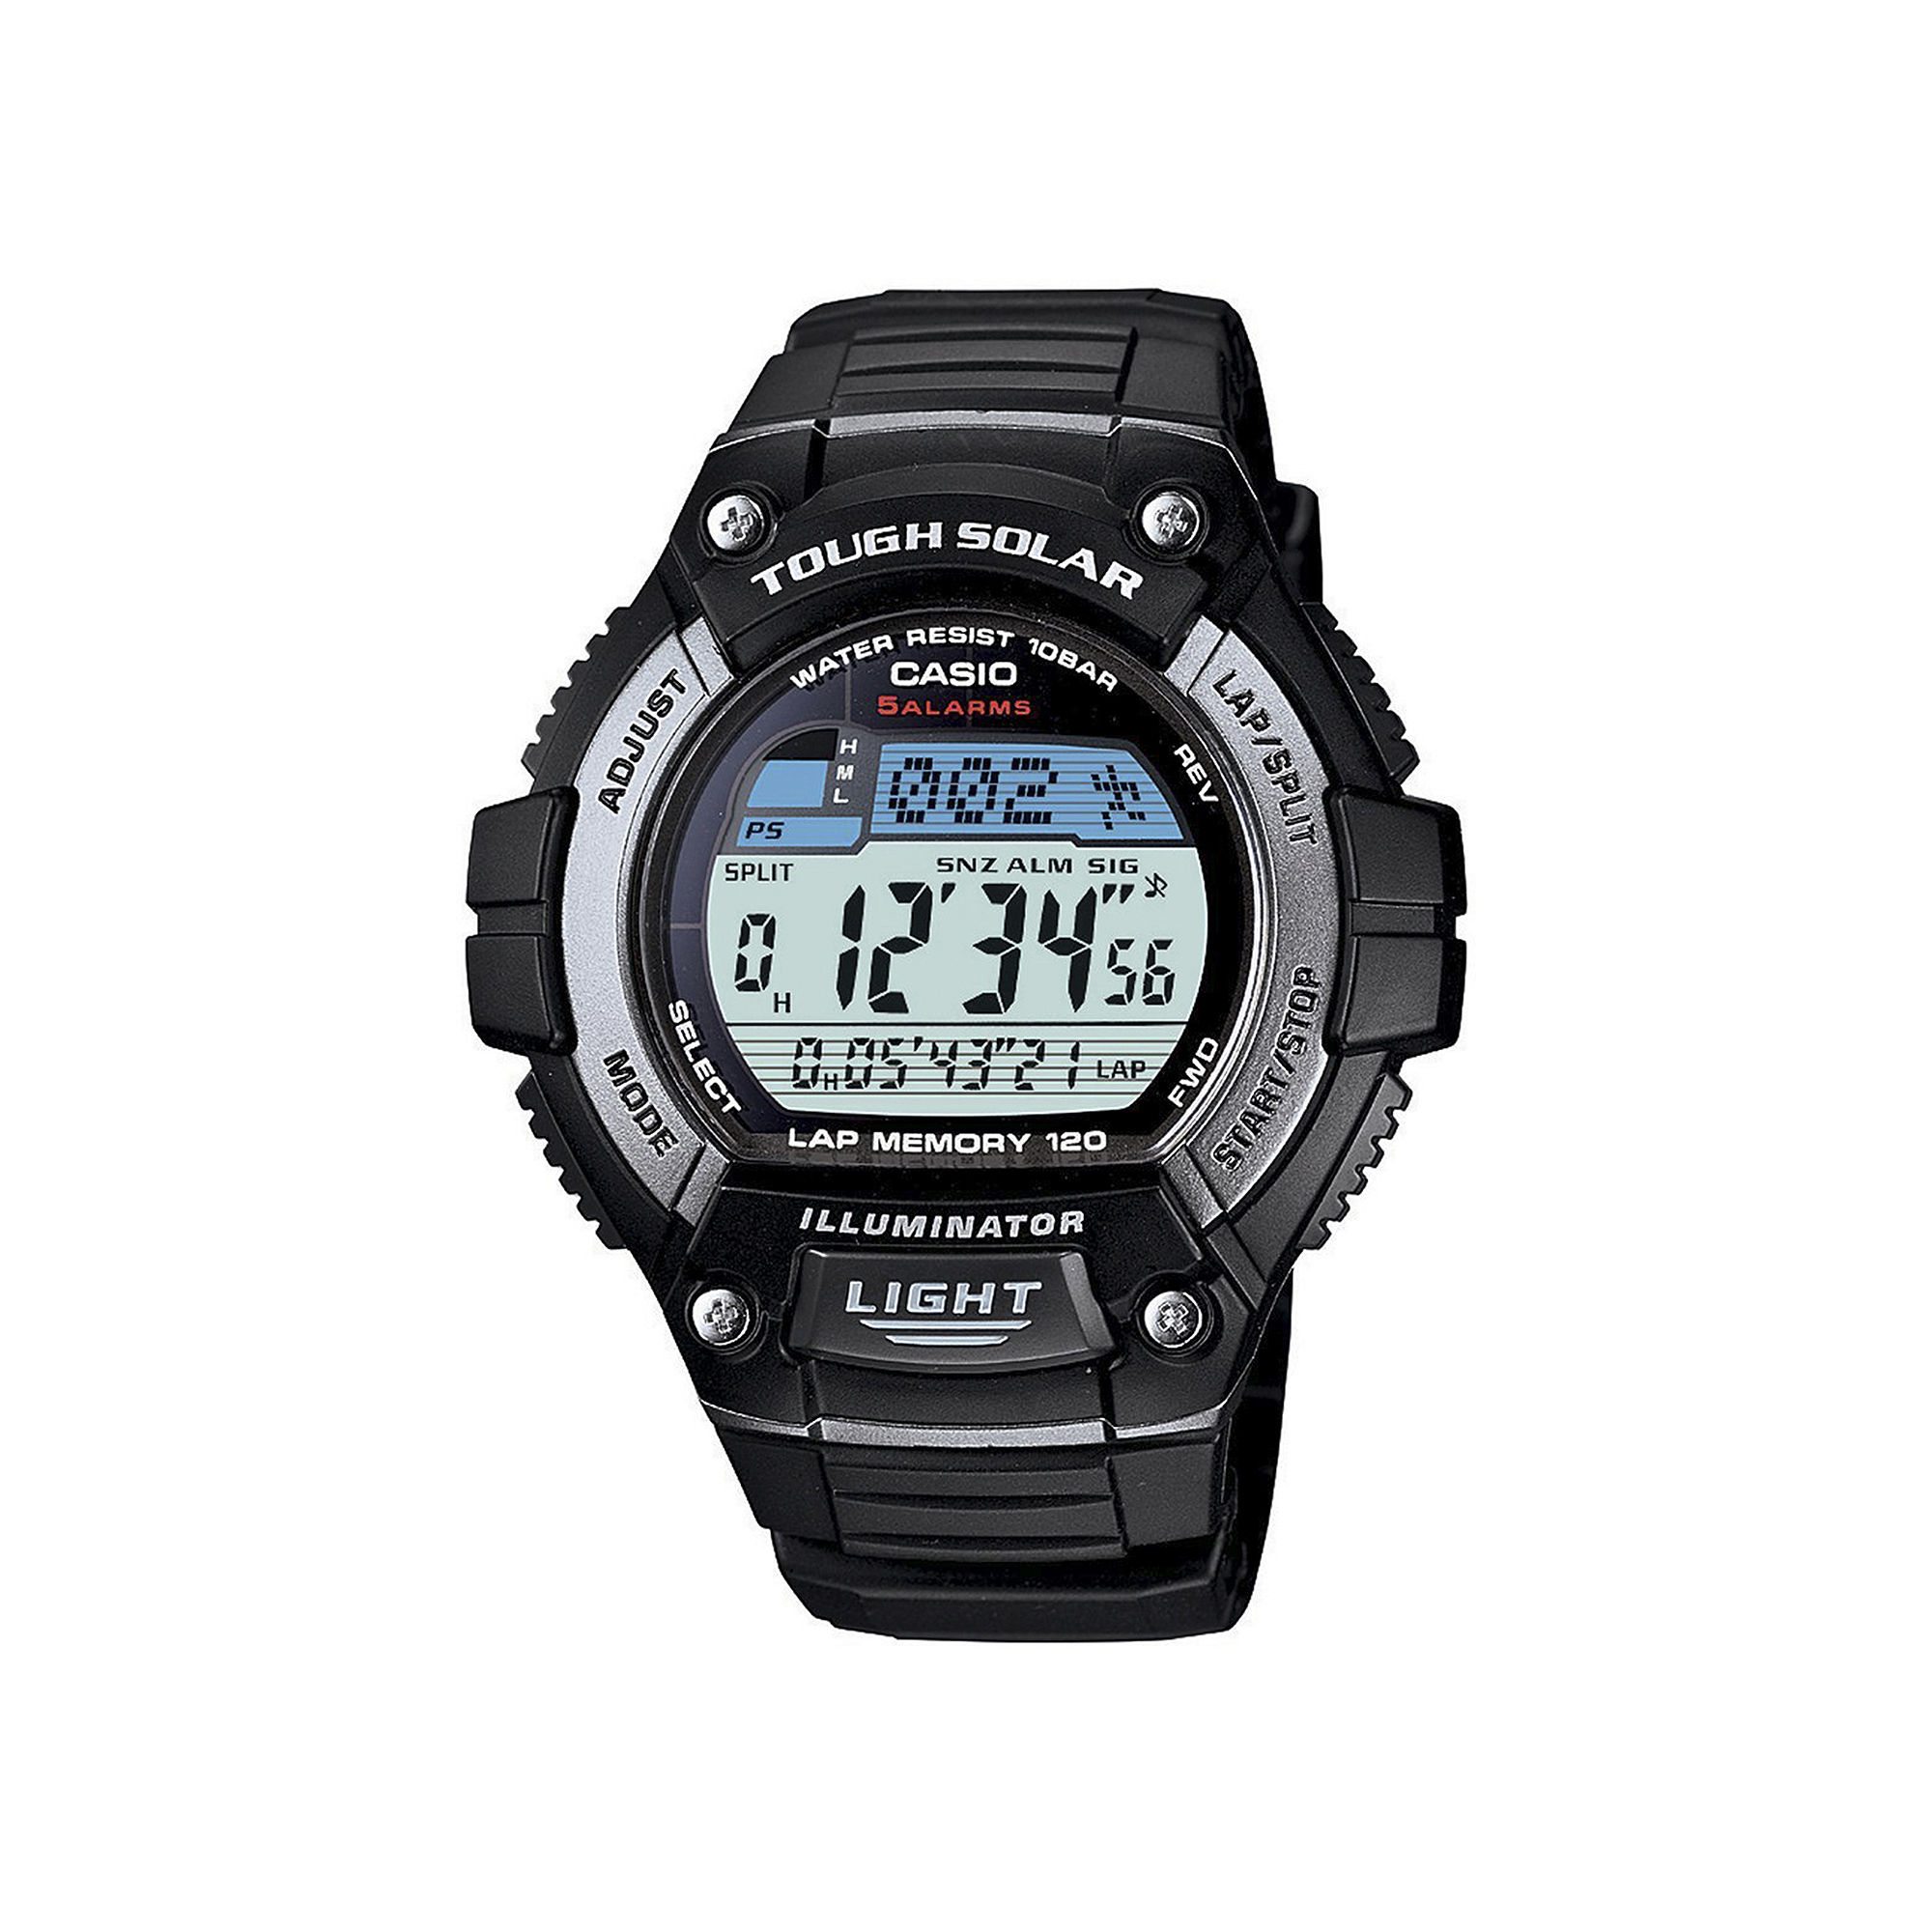 Casio Tough Solar Illuminator Mens Digital Watch WS220-1A